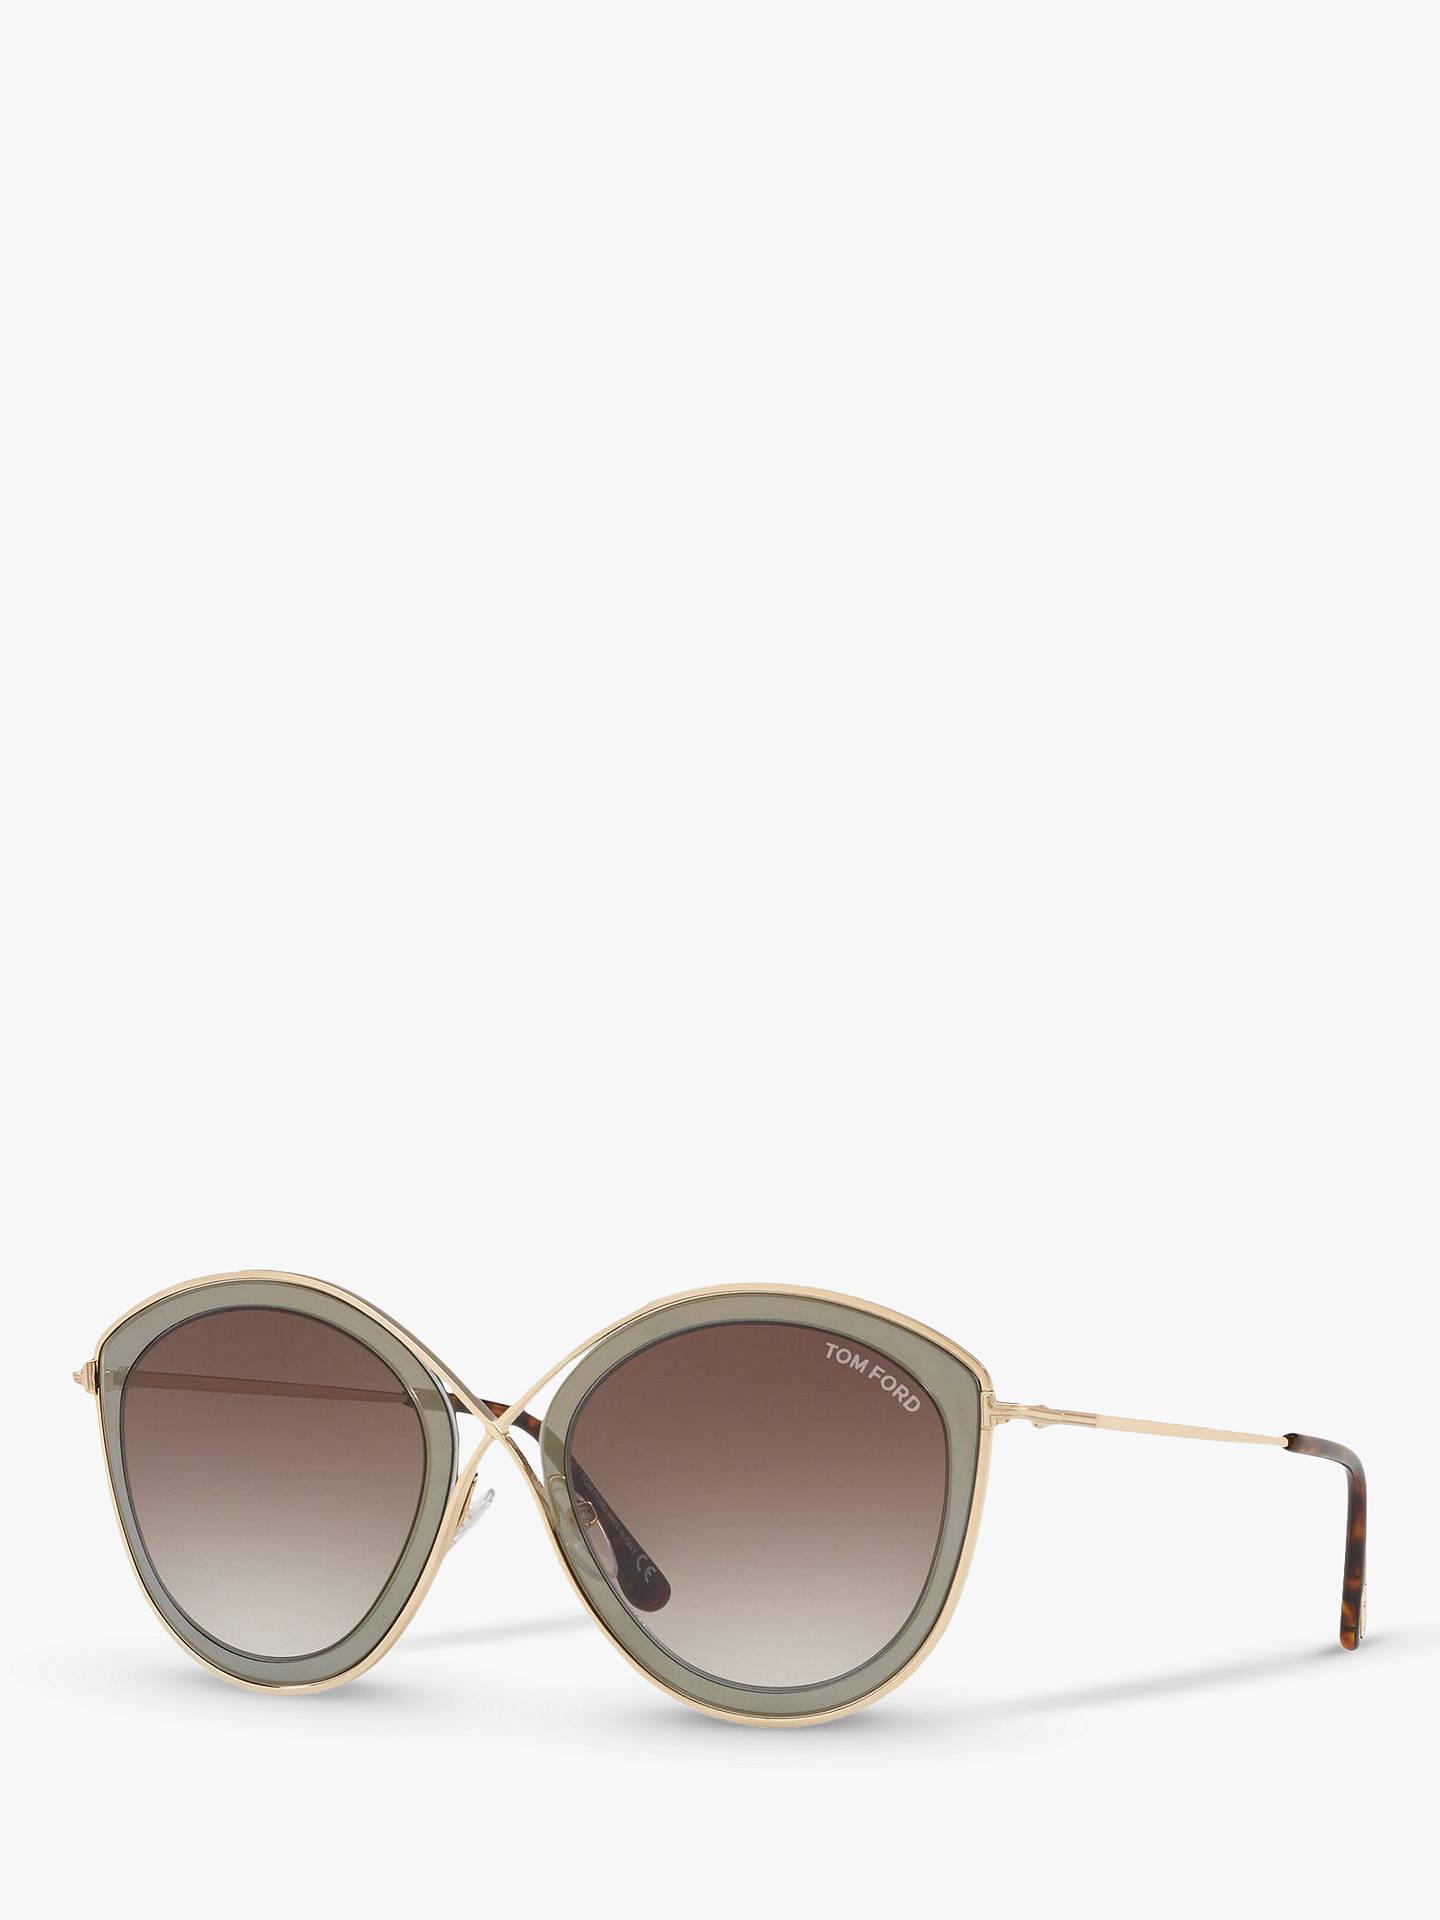 a03219ceaf5 Buy TOM FORD FT0604 Women s Sascha Cat s Eye Sunglasses